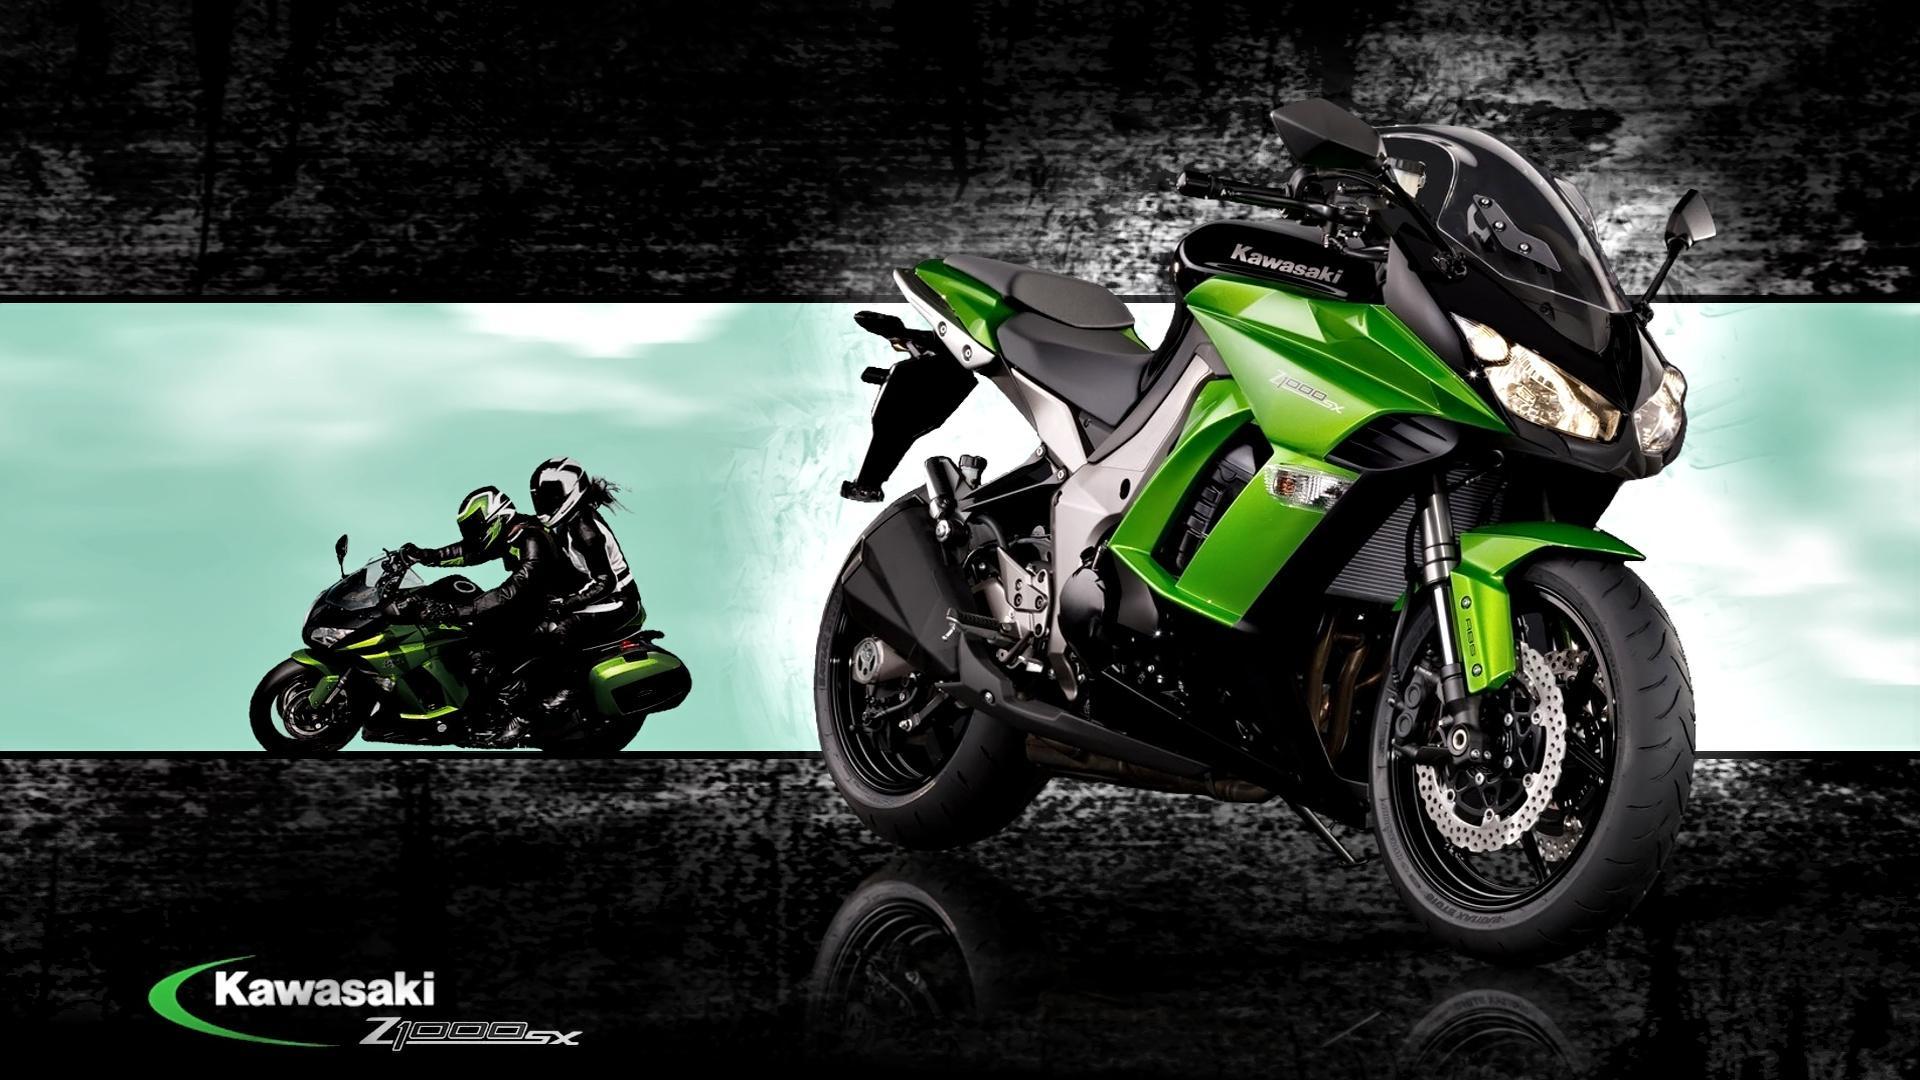 Обои спортивный, z 1000 sx, profile, Kawasaki, Мотоцикл. Мотоциклы foto 7